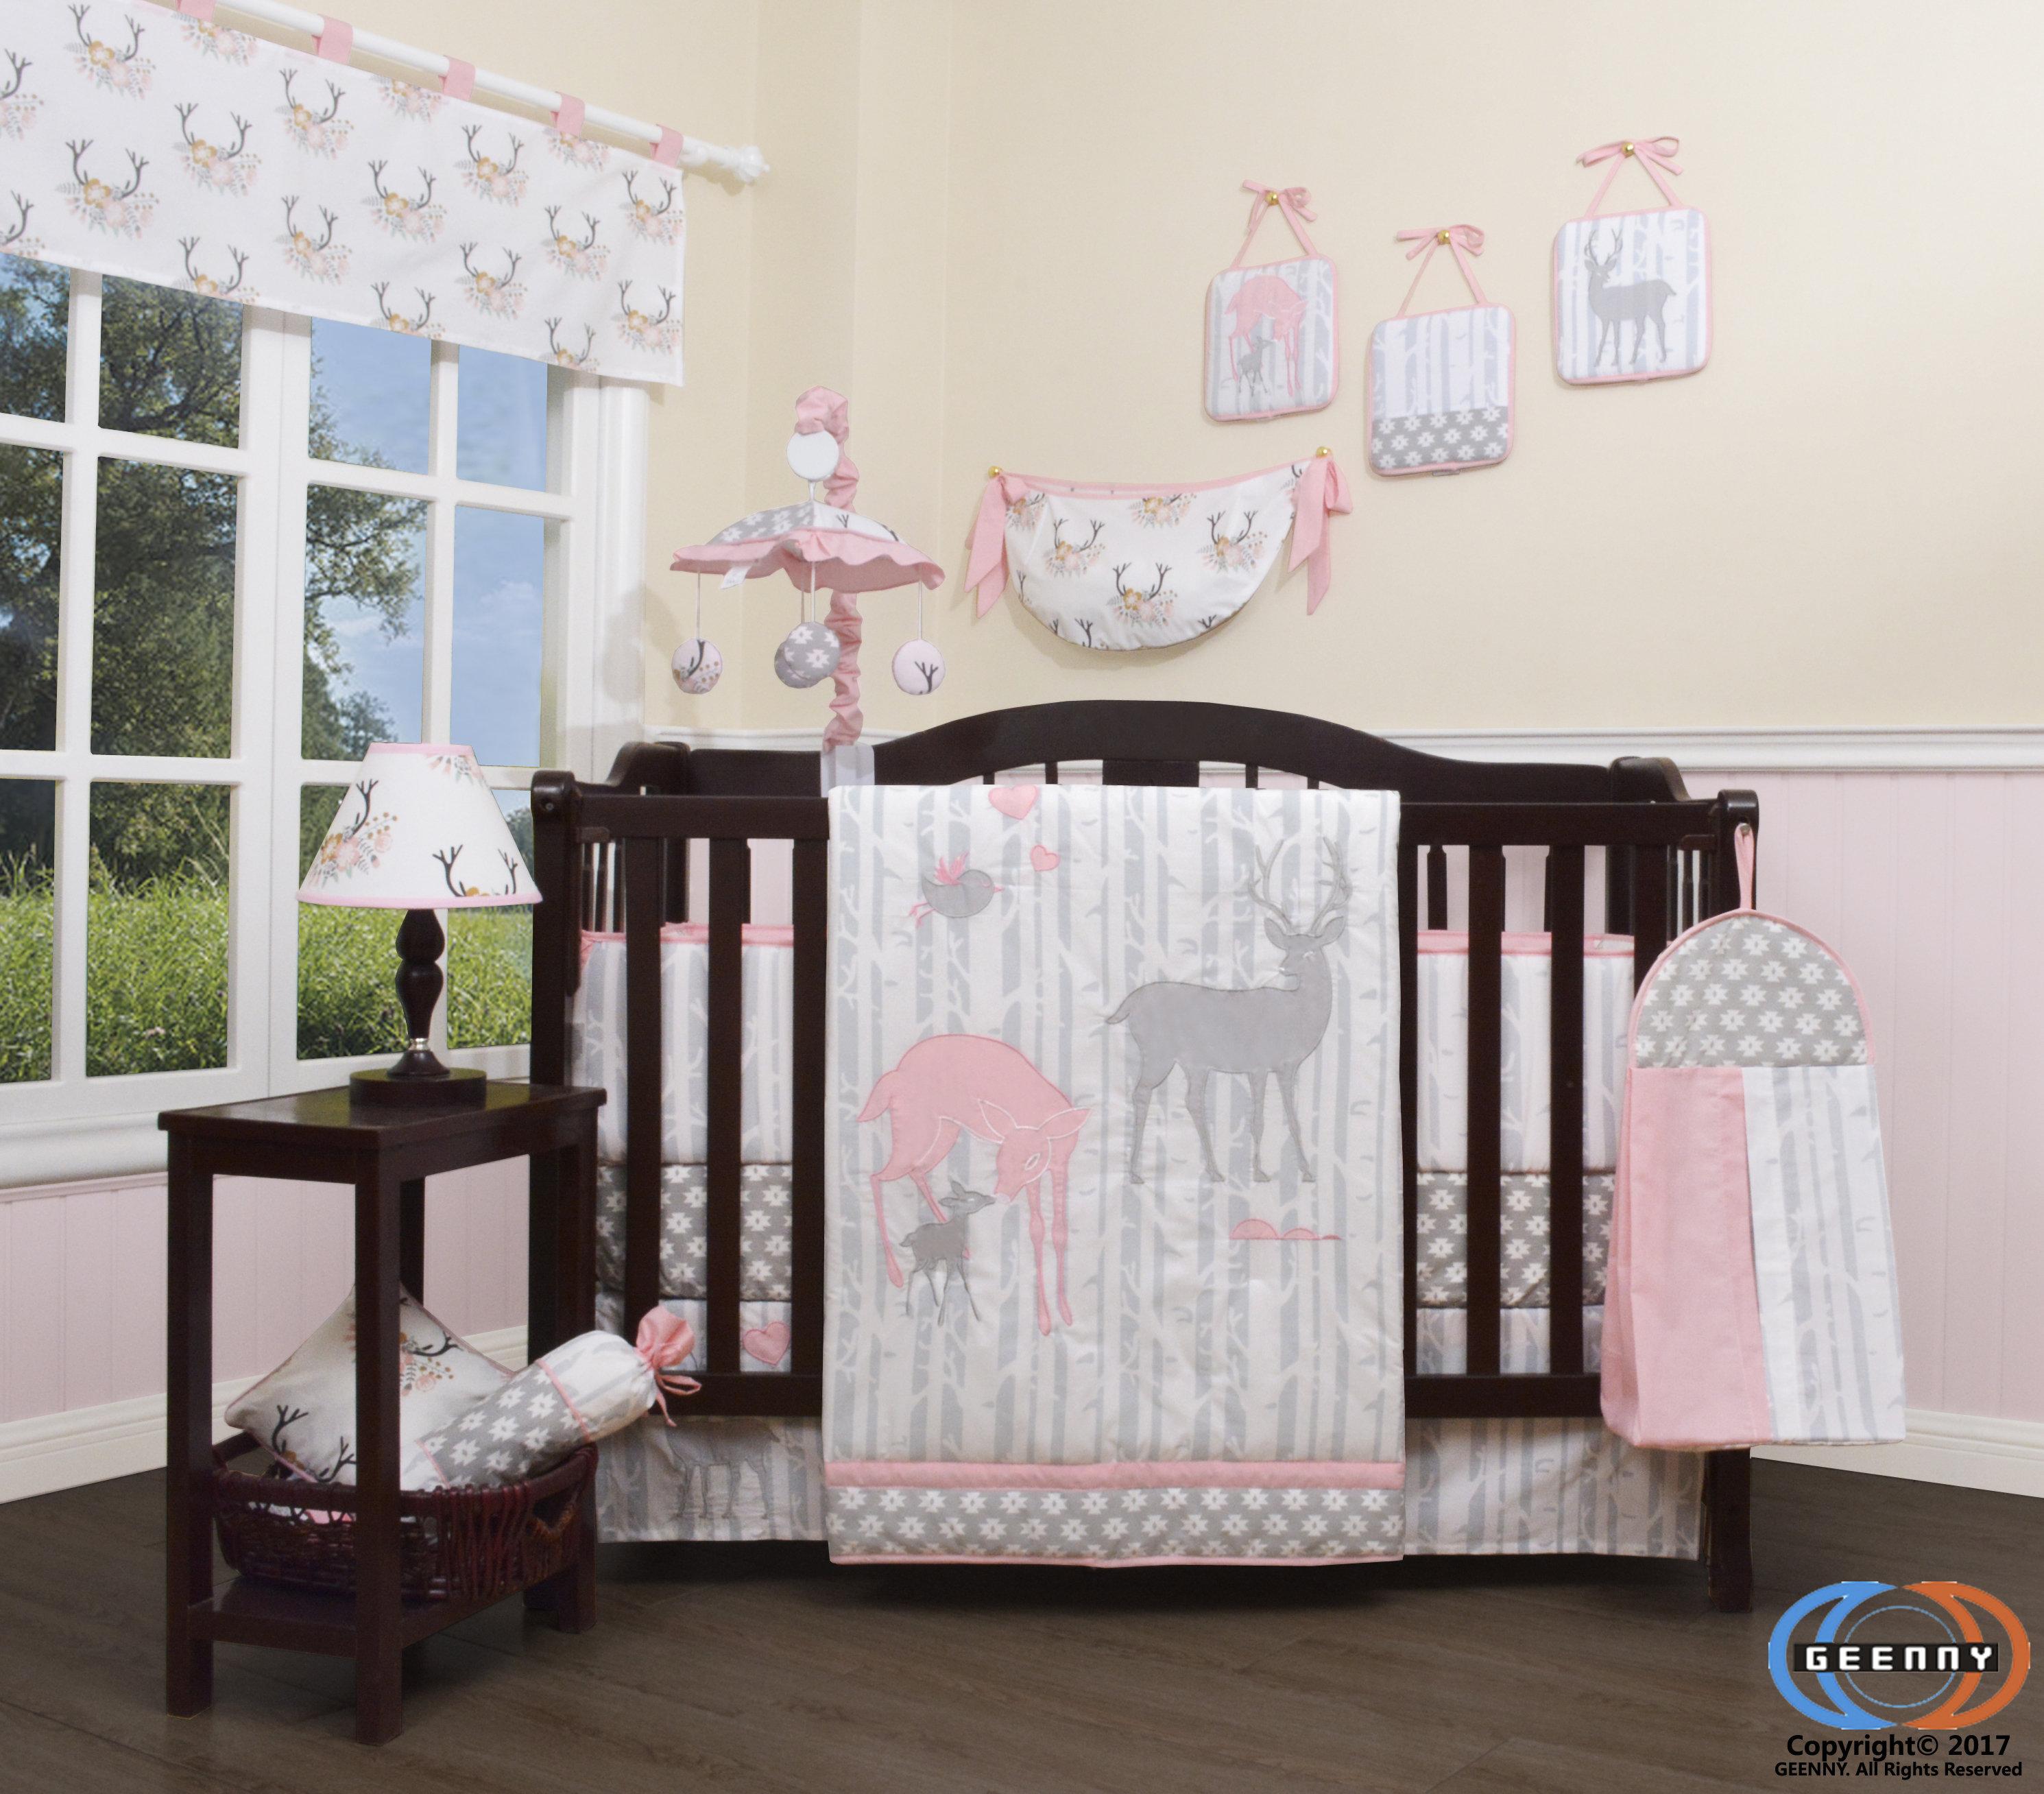 Harriet Bee Three Lakes Baby Girl Deer Family Nursery 13 Piece Crib Bedding  Set & Reviews | Wayfair